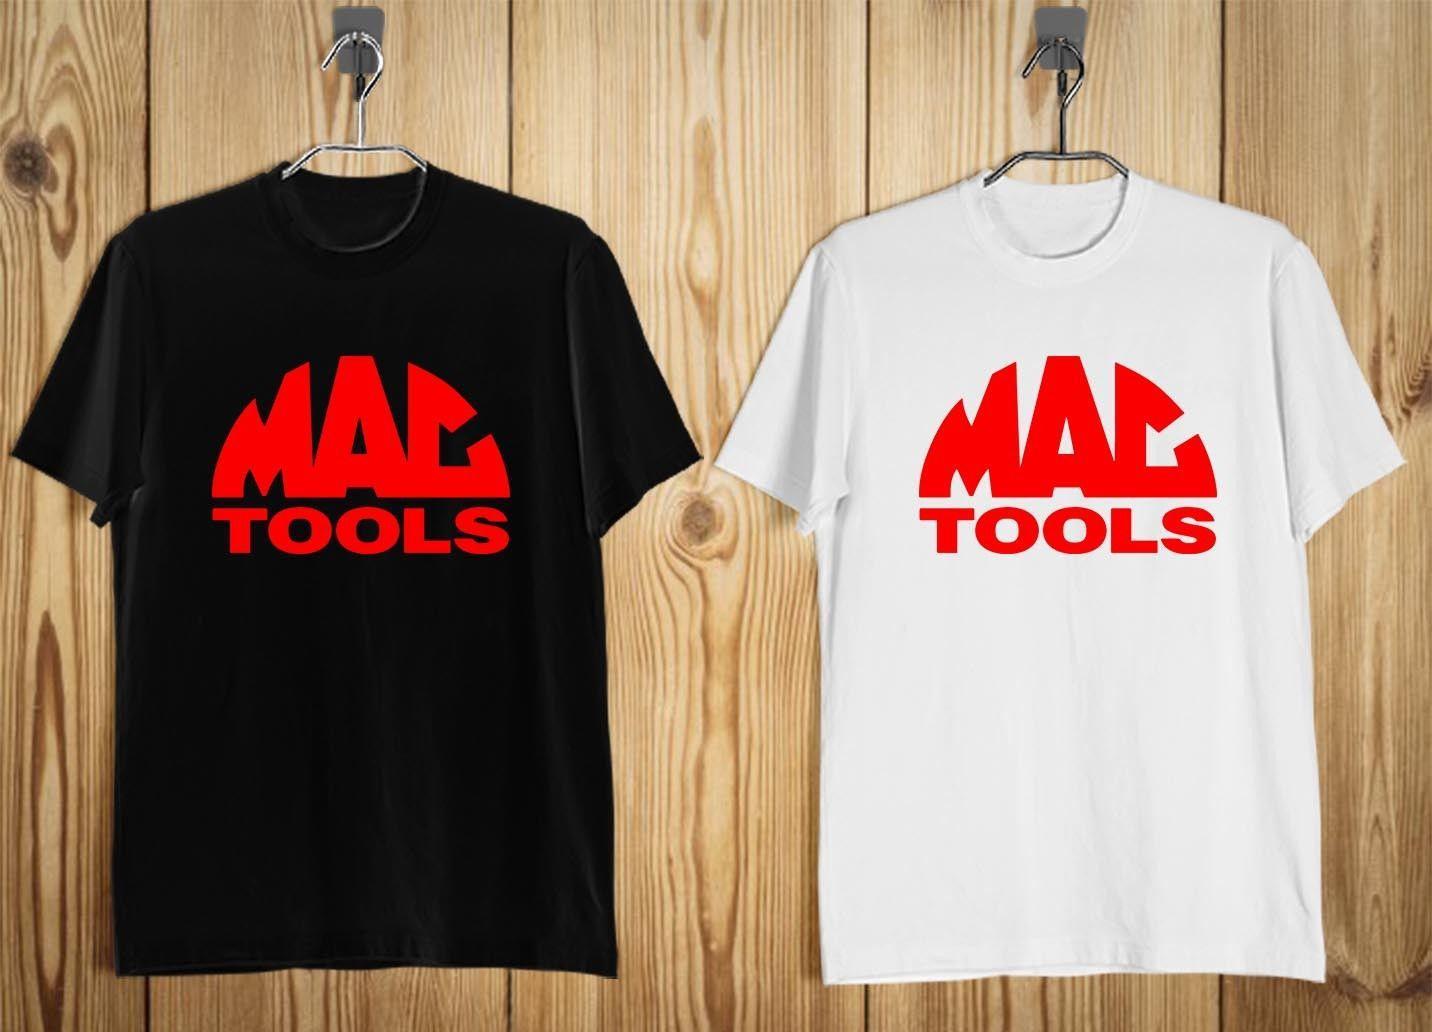 Matco Tools Logo Men s T-Shirt Black White bFunny free shipping Unisex  Casual Tshirt